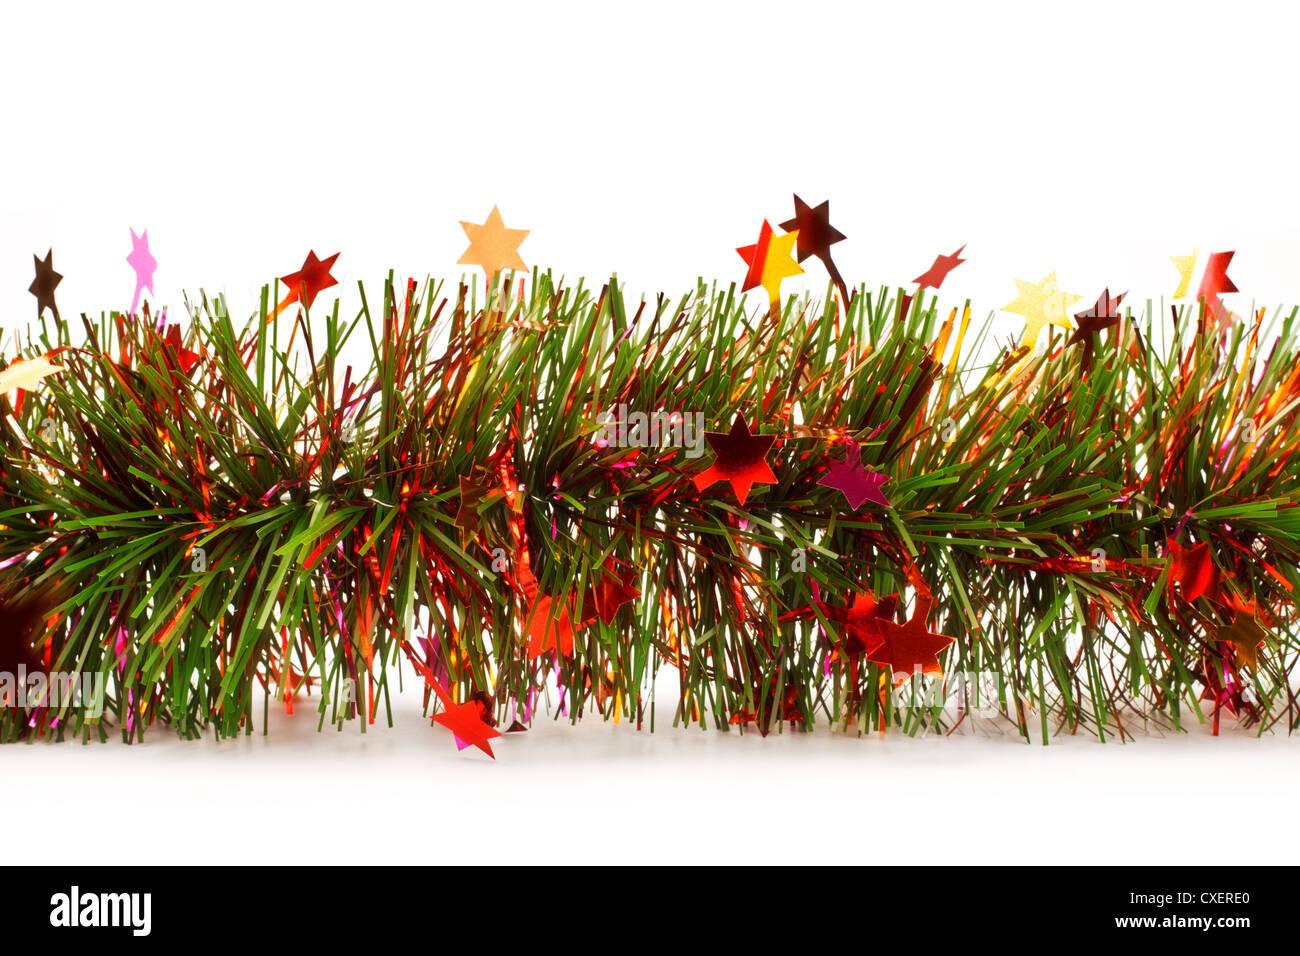 christmas tinsel garland with stars - Stock Image